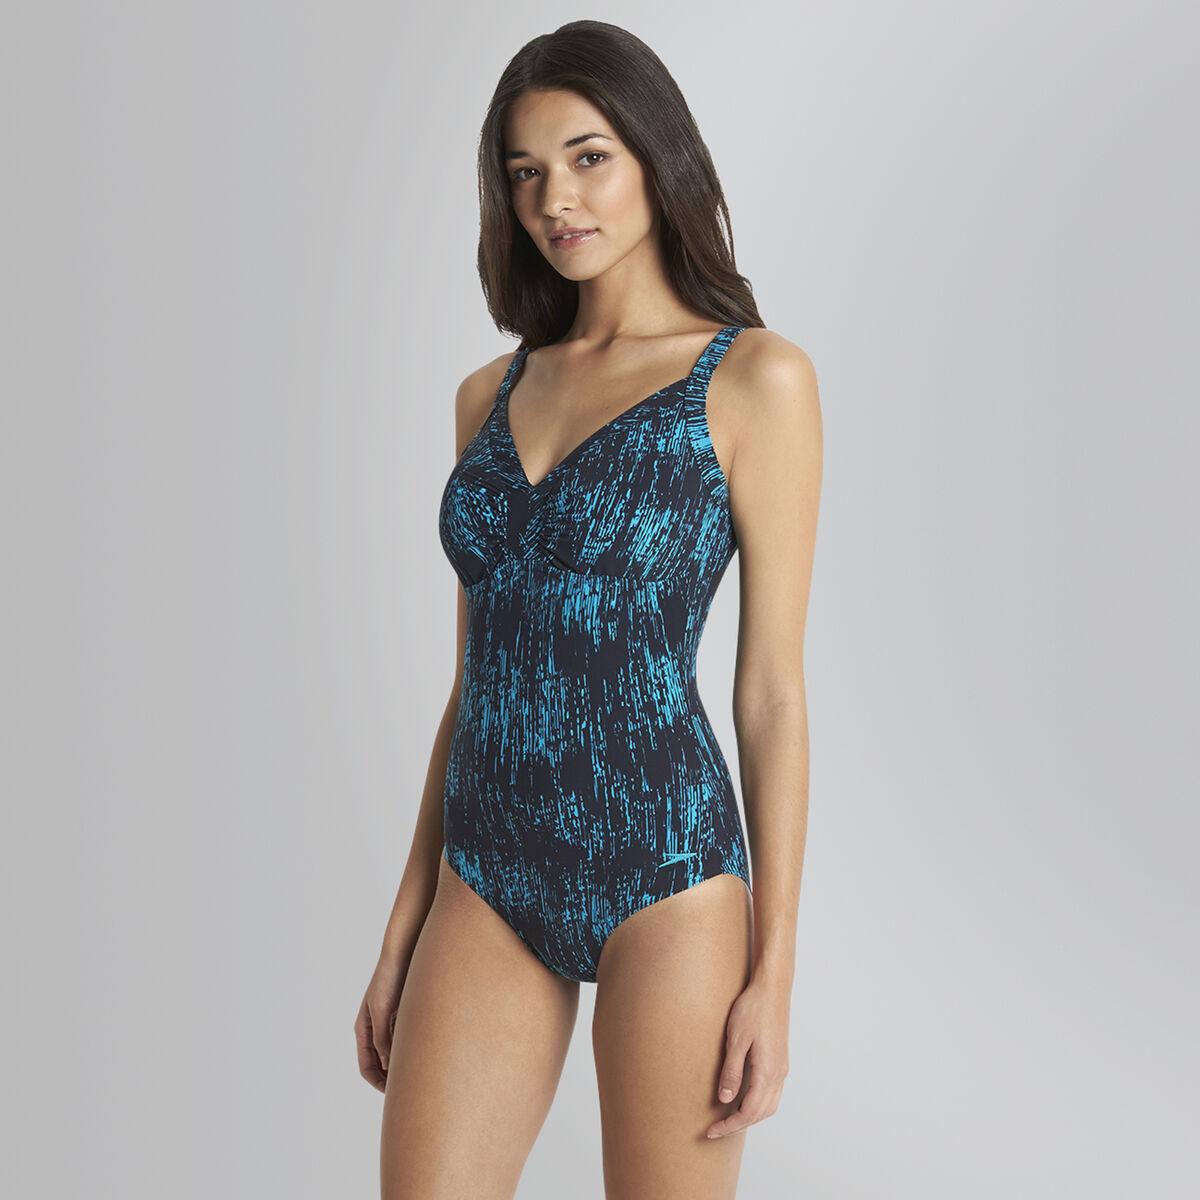 Sculpture Printed Watergem Adjustable Swimsuit